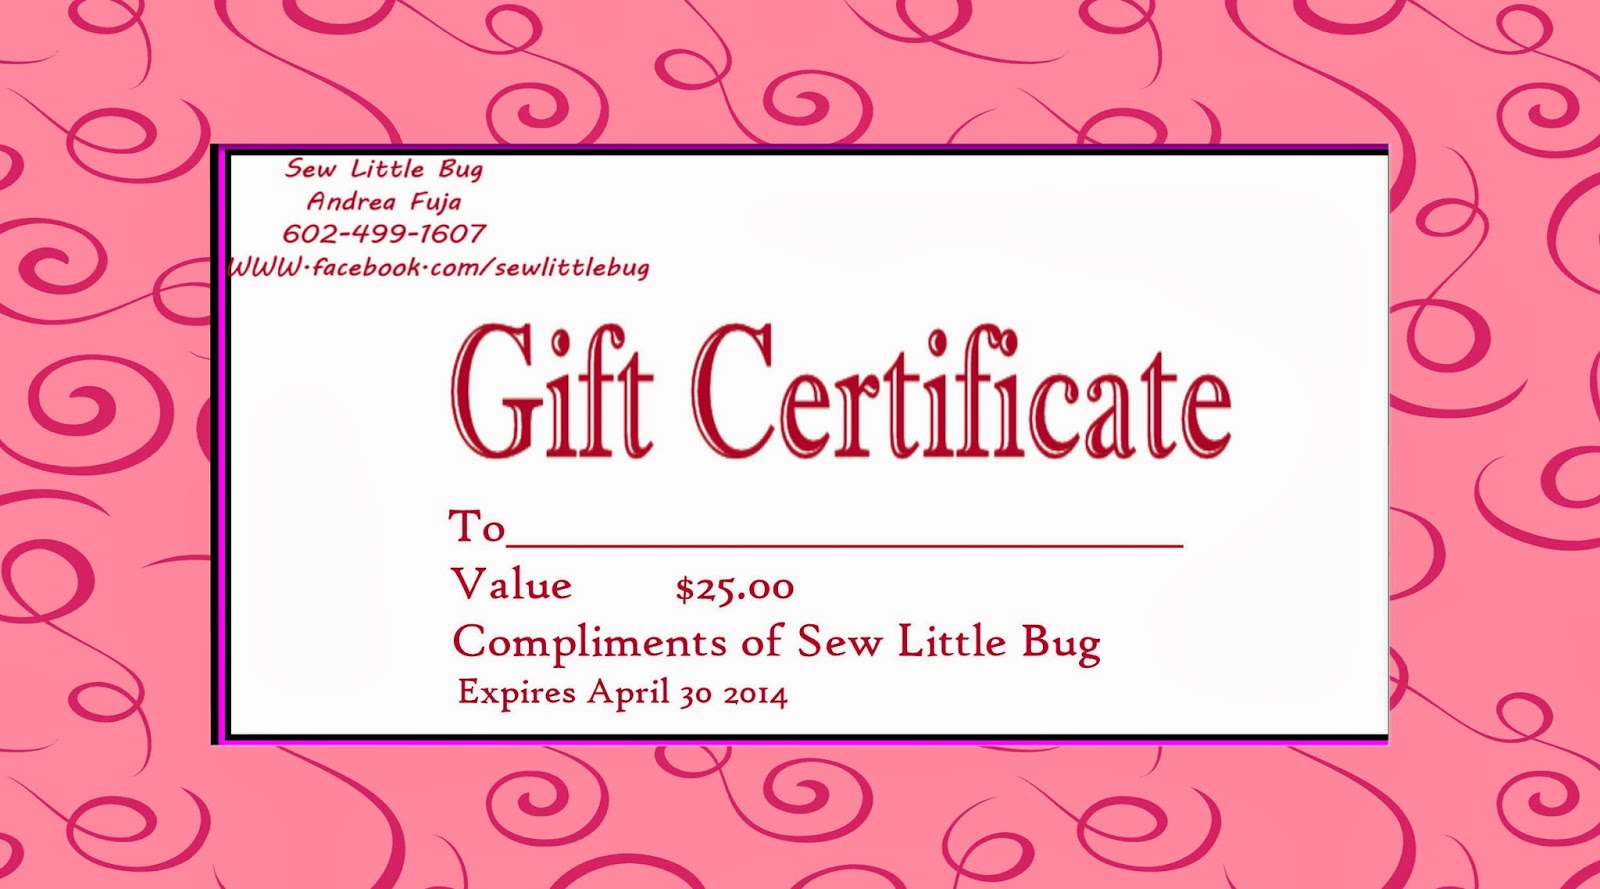 Mary gift certificate pdf pasoevolist mary gift certificate pdf yadclub Choice Image